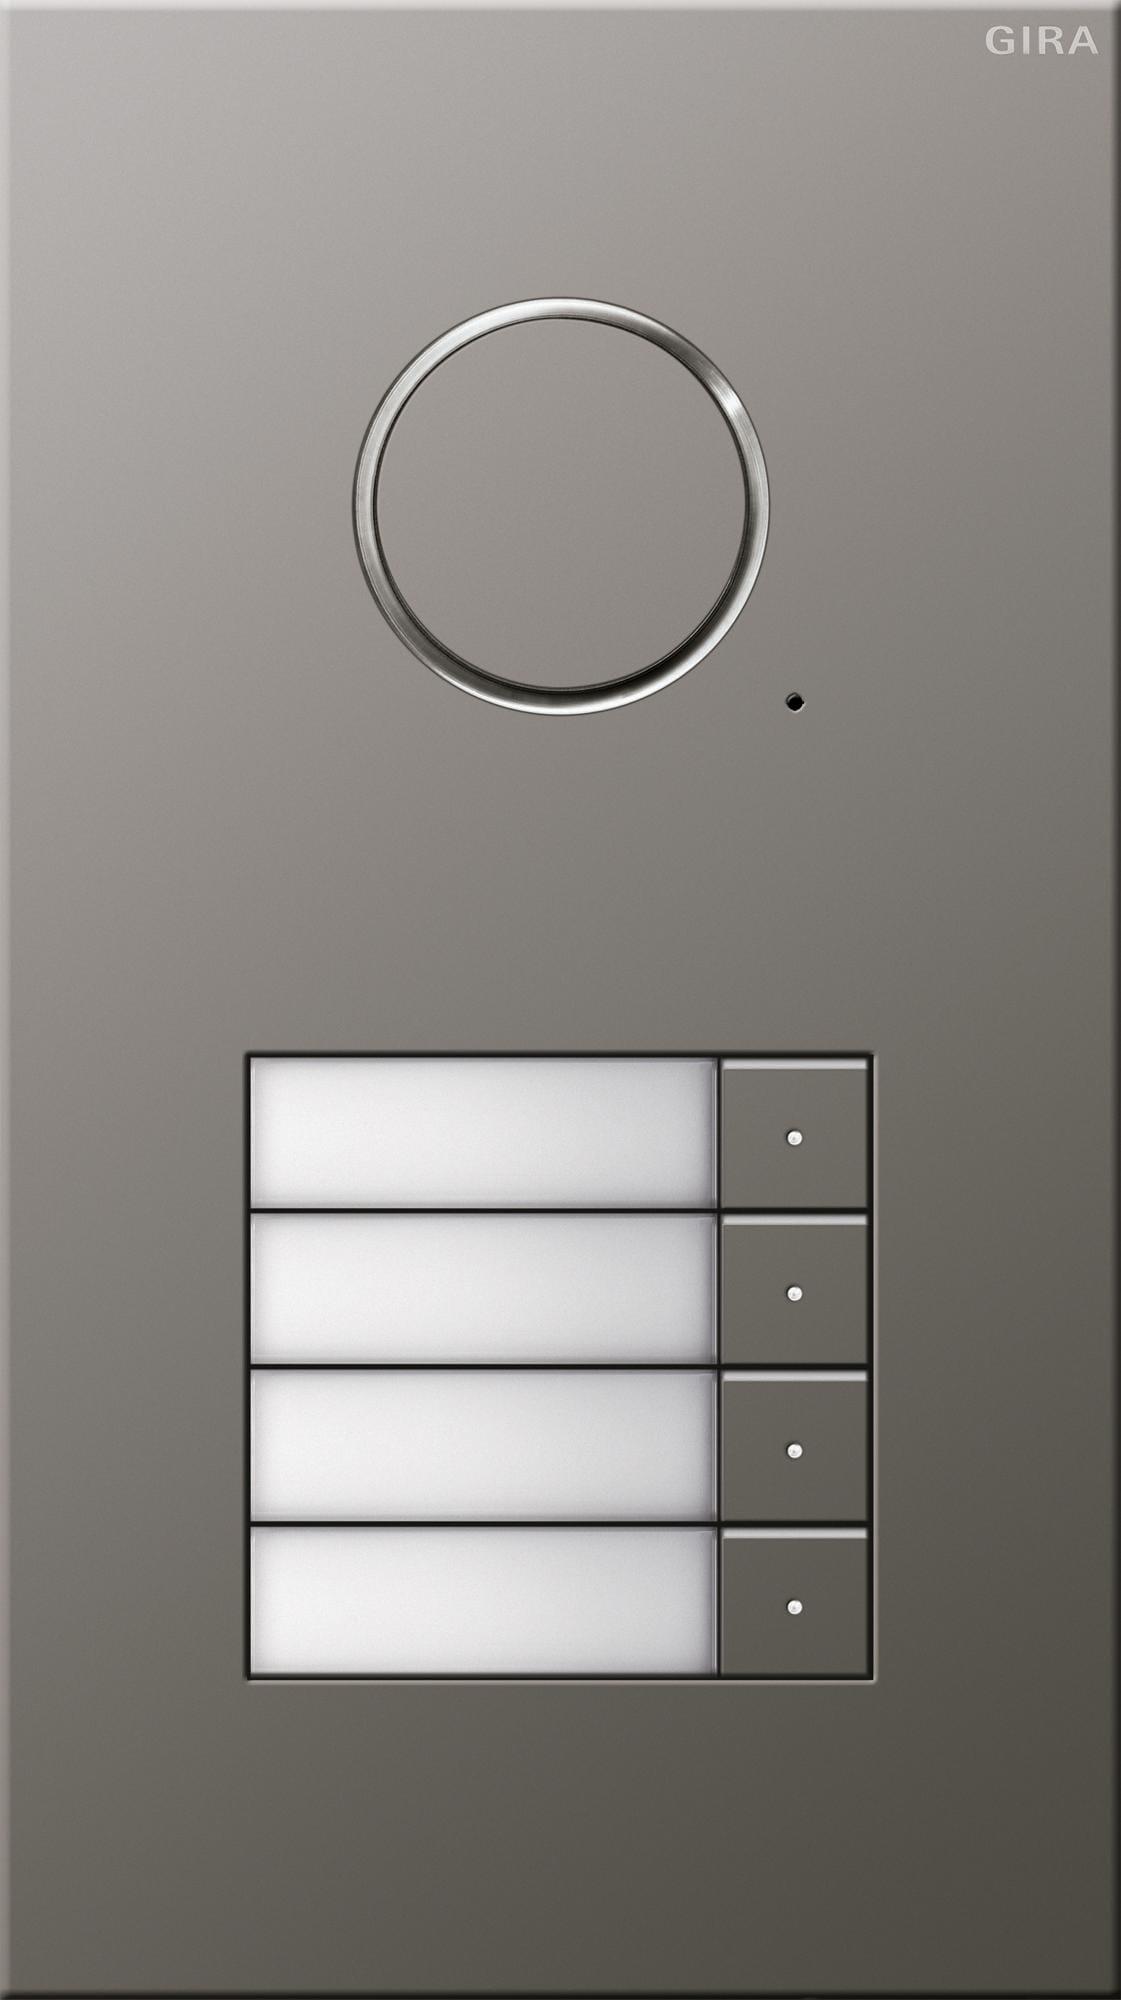 t rstation edelstahl 4fach gira 250420 von gira. Black Bedroom Furniture Sets. Home Design Ideas